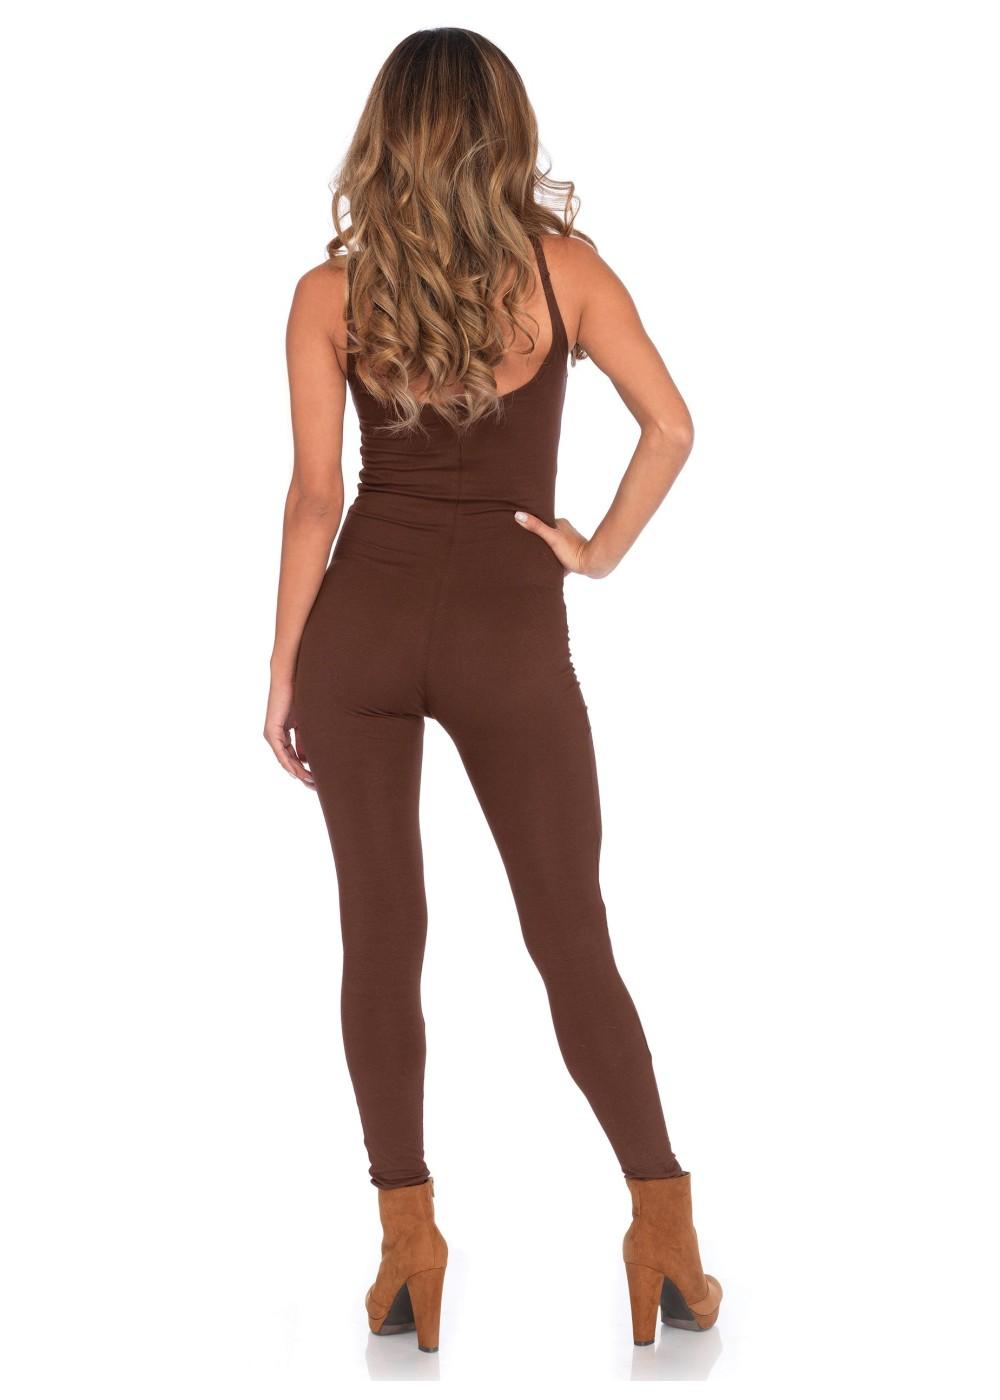 Brown Basic Unitard Women - Dancewear Costumes